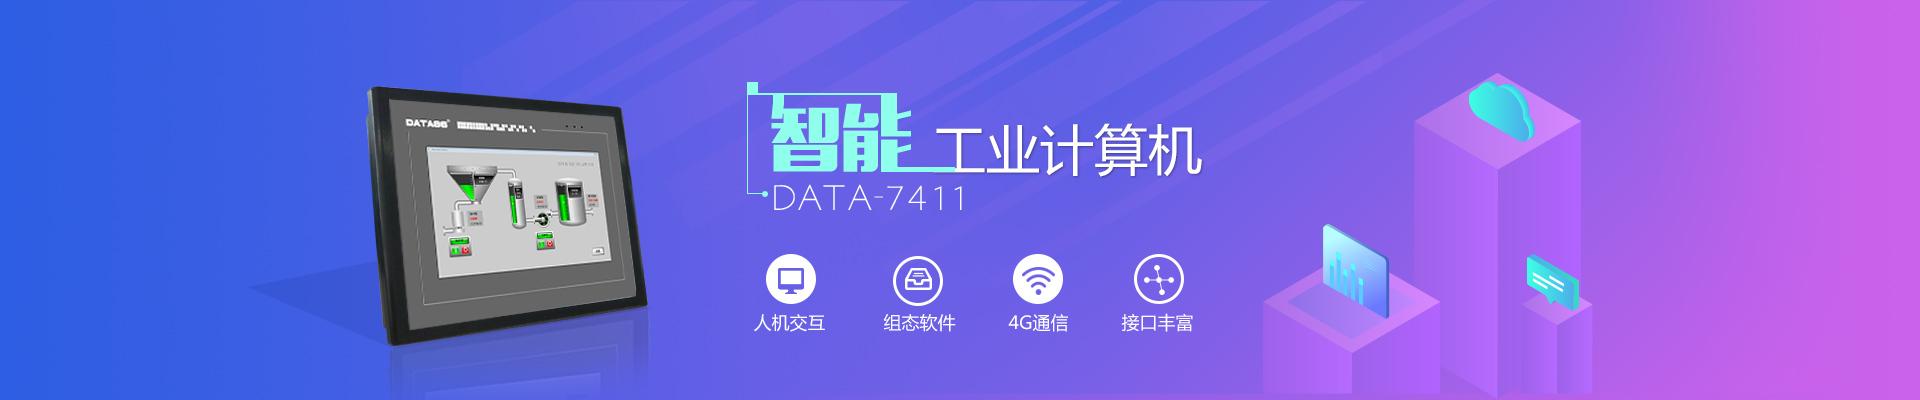 NB-IoT/gprs/4g rtu,电池供电rtu